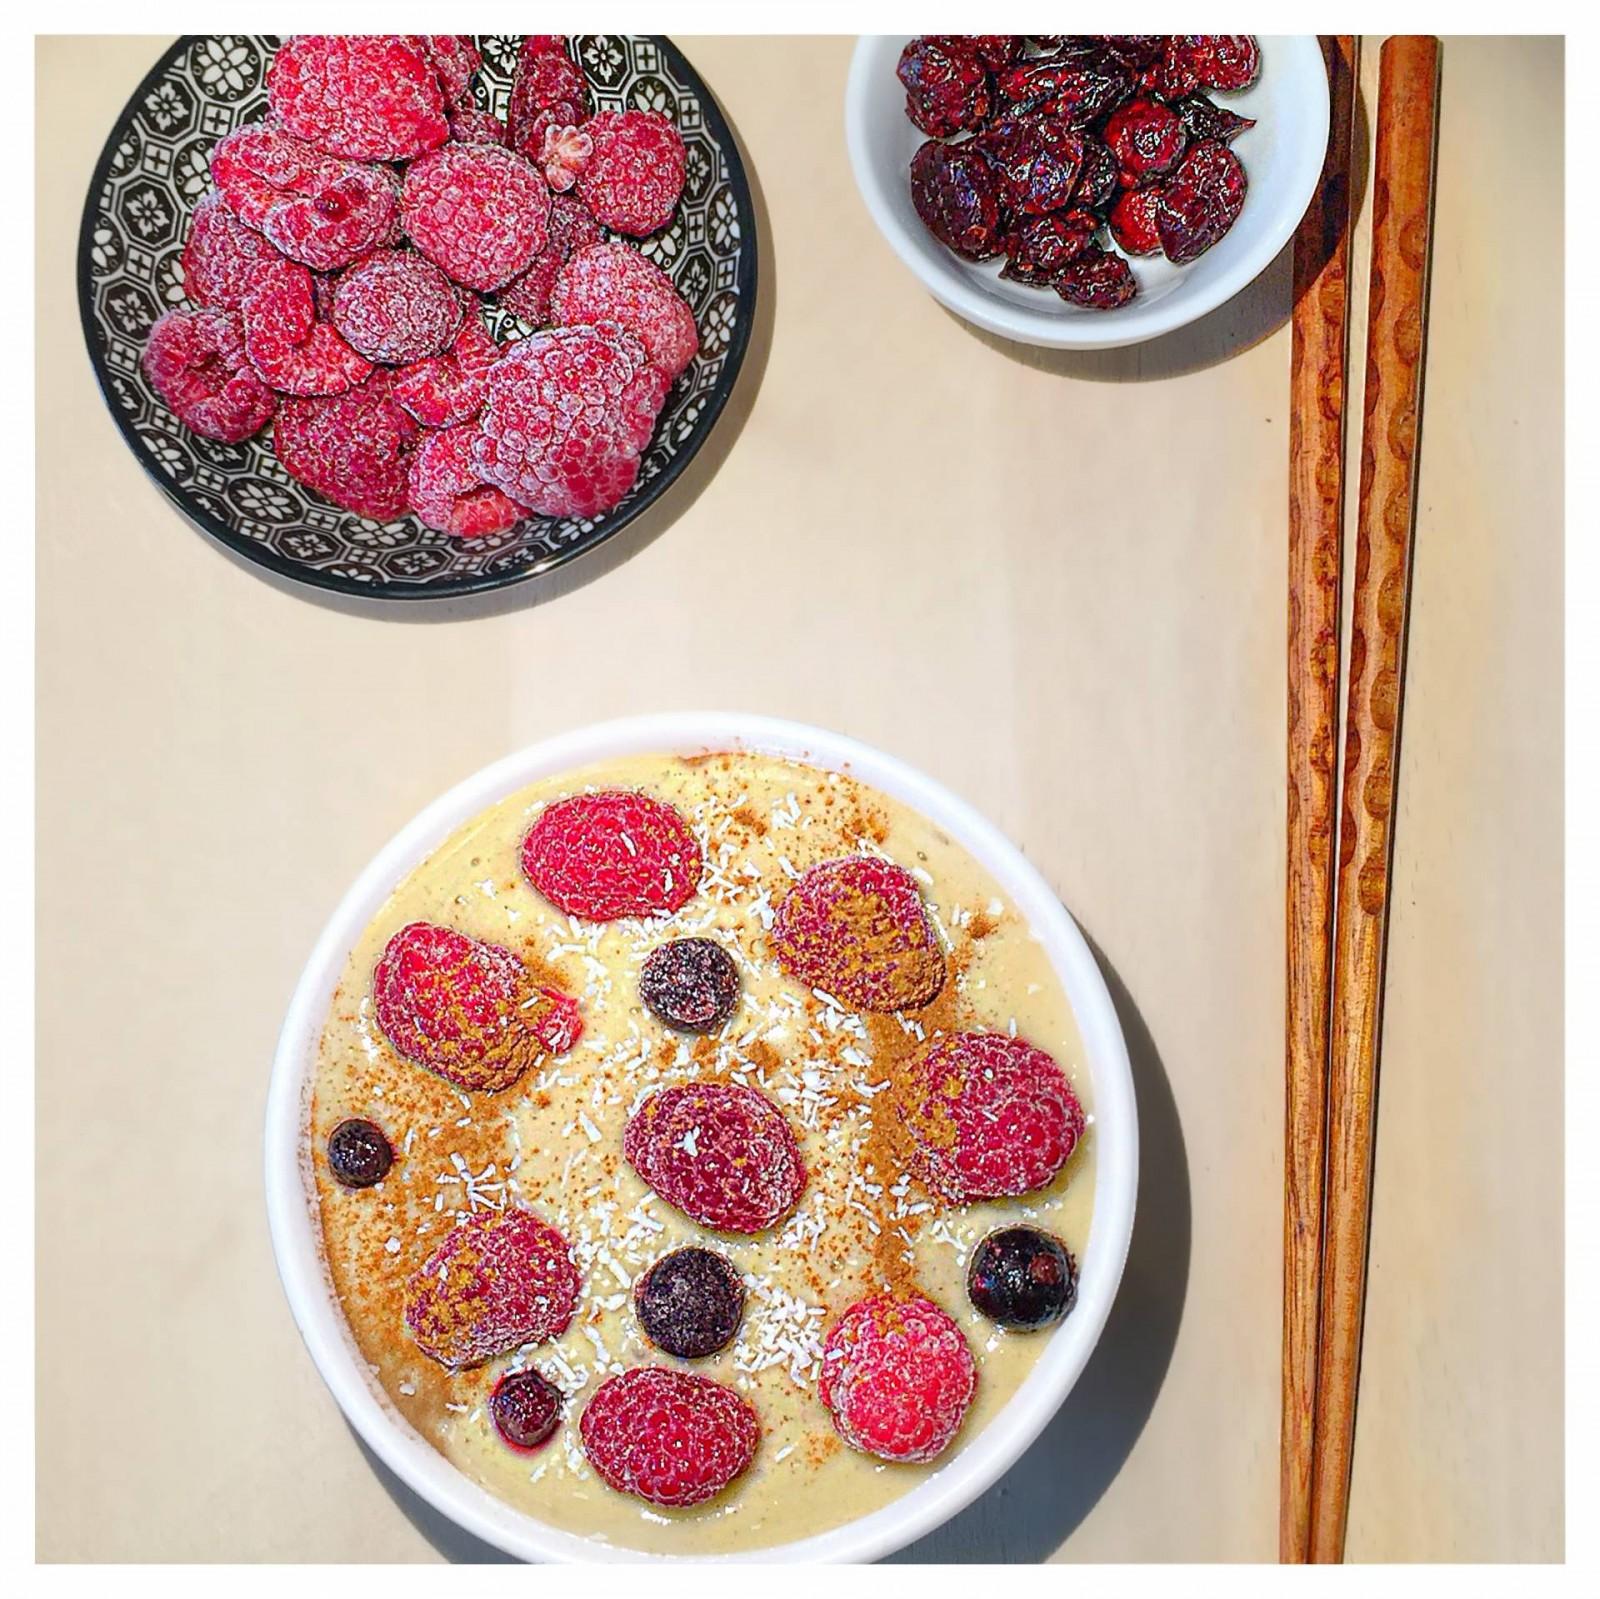 Lemon/Pineapple Smoothie Bowl